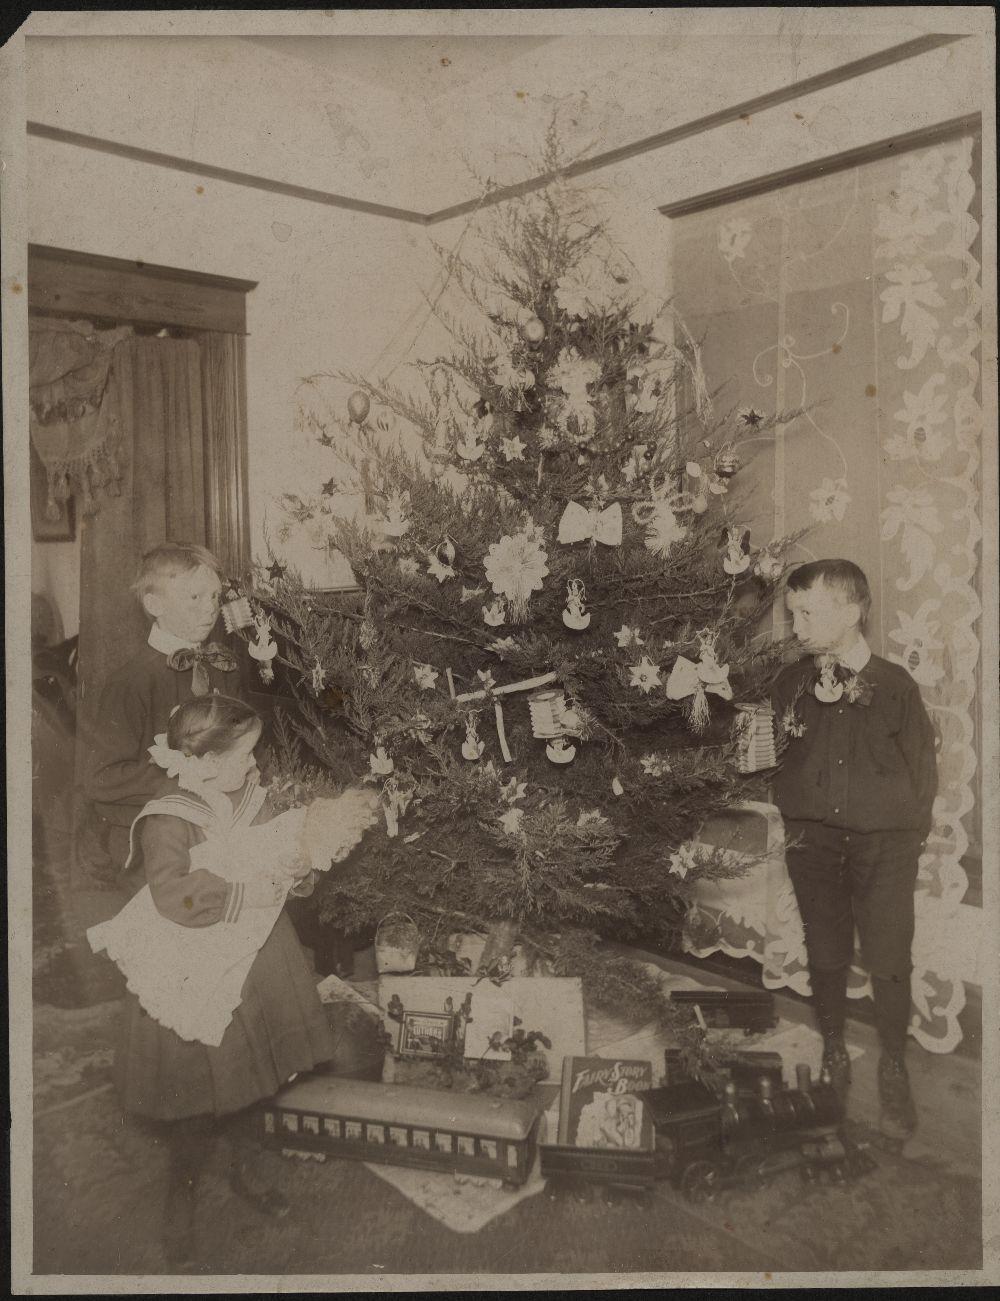 Children around a decorated Christmas tree